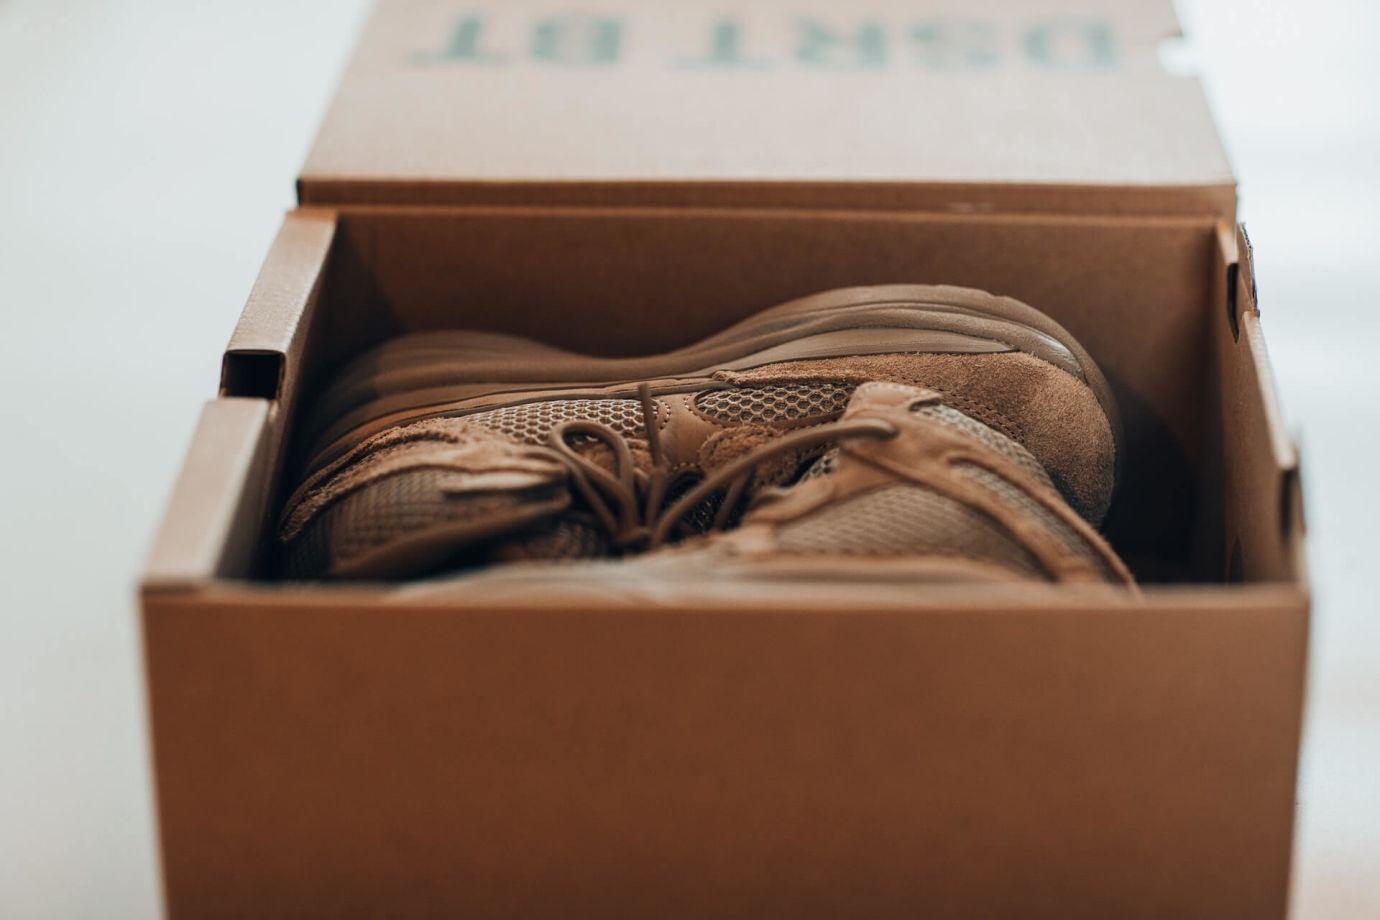 Braune Sneaker in Schuhkarton